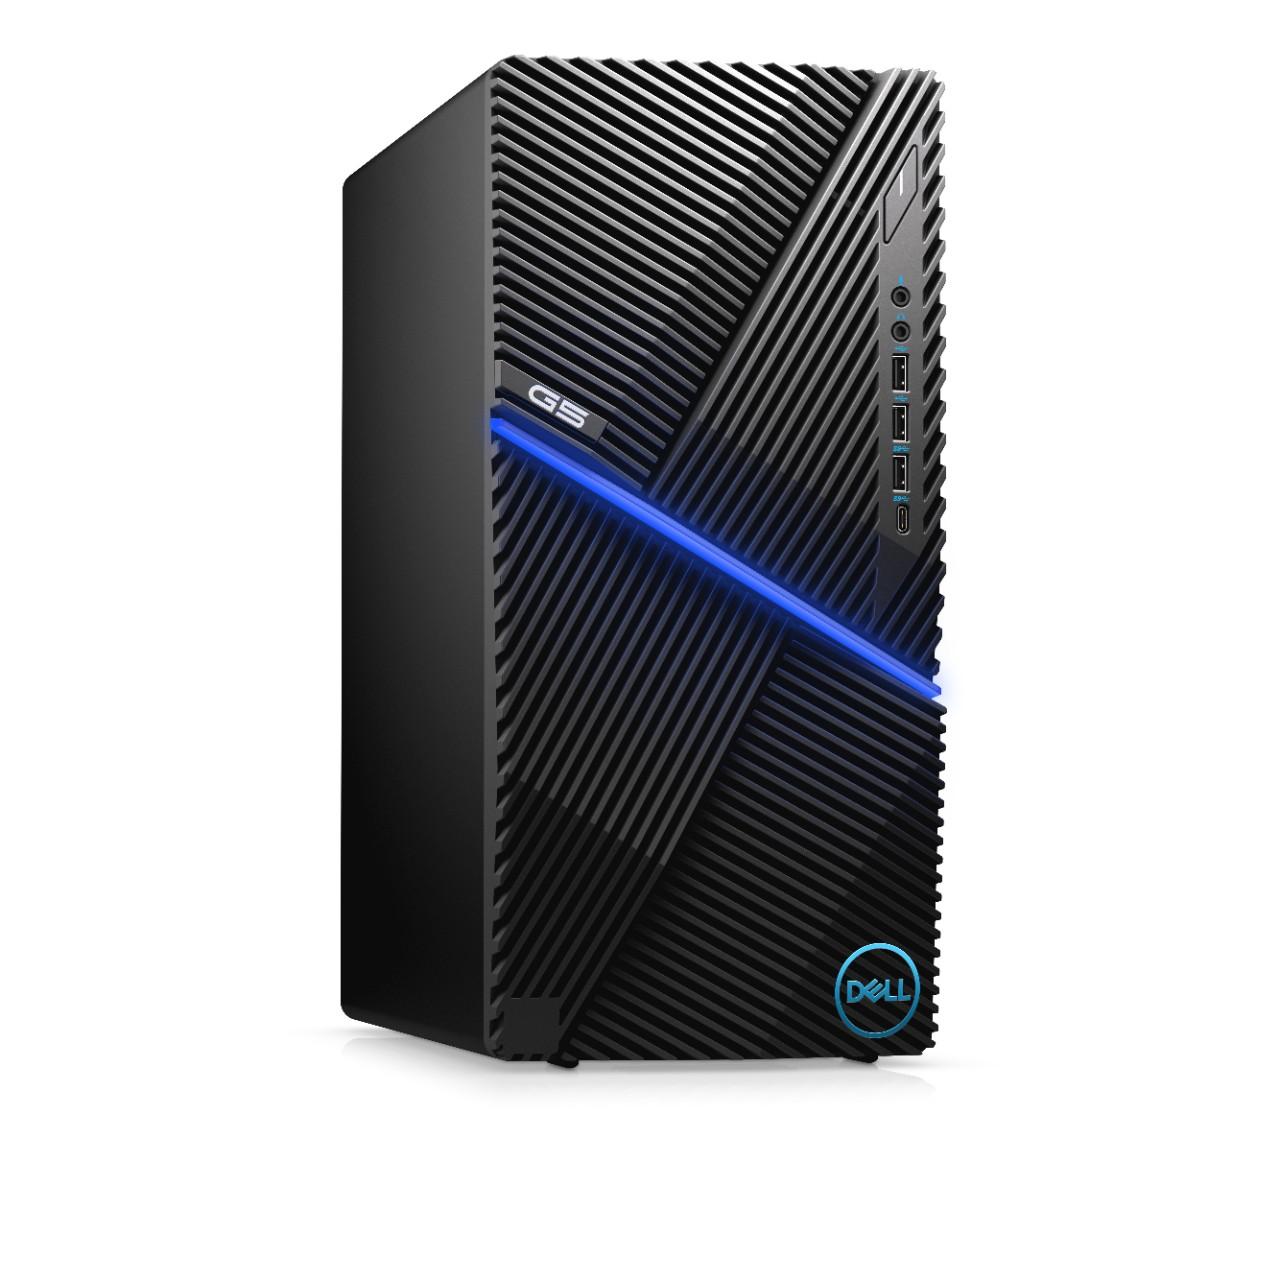 Dell G5 5000 DT i5-10500F/8GB/512GB/GTX1660/W10Home/2RNBD/Černý